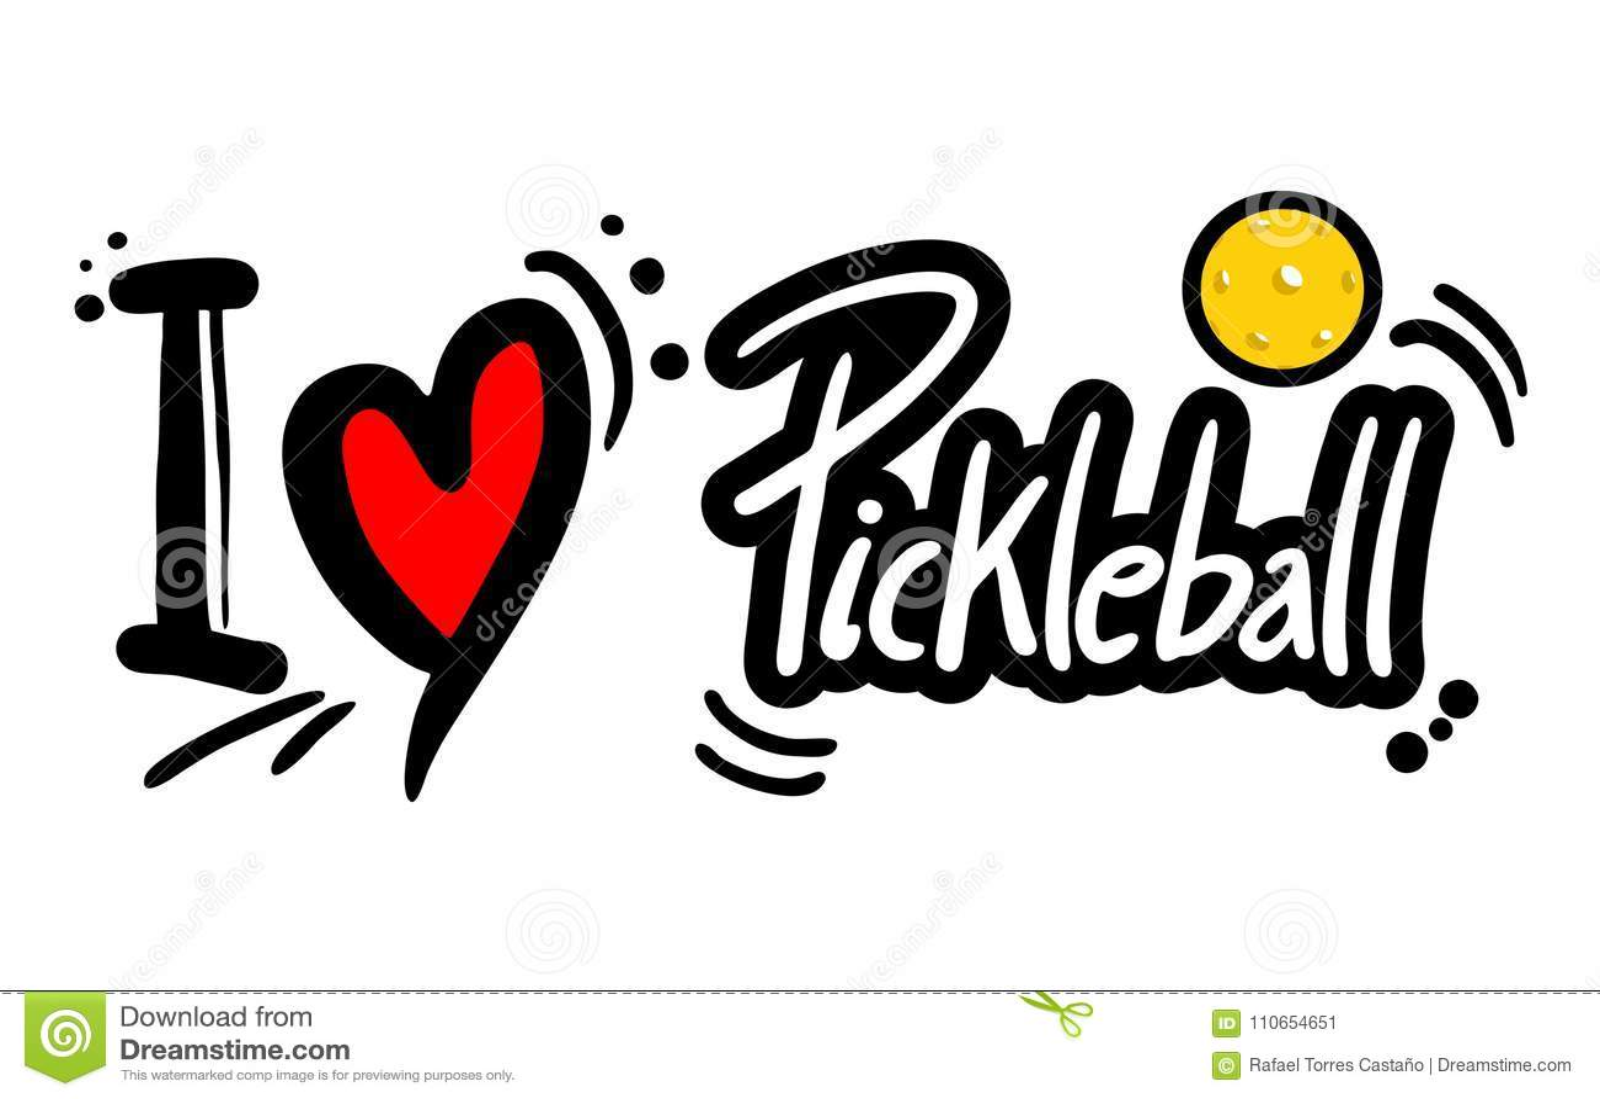 hight resolution of pickleball stock illustrations 239 pickleball stock illustrations vectors clipart dreamstime